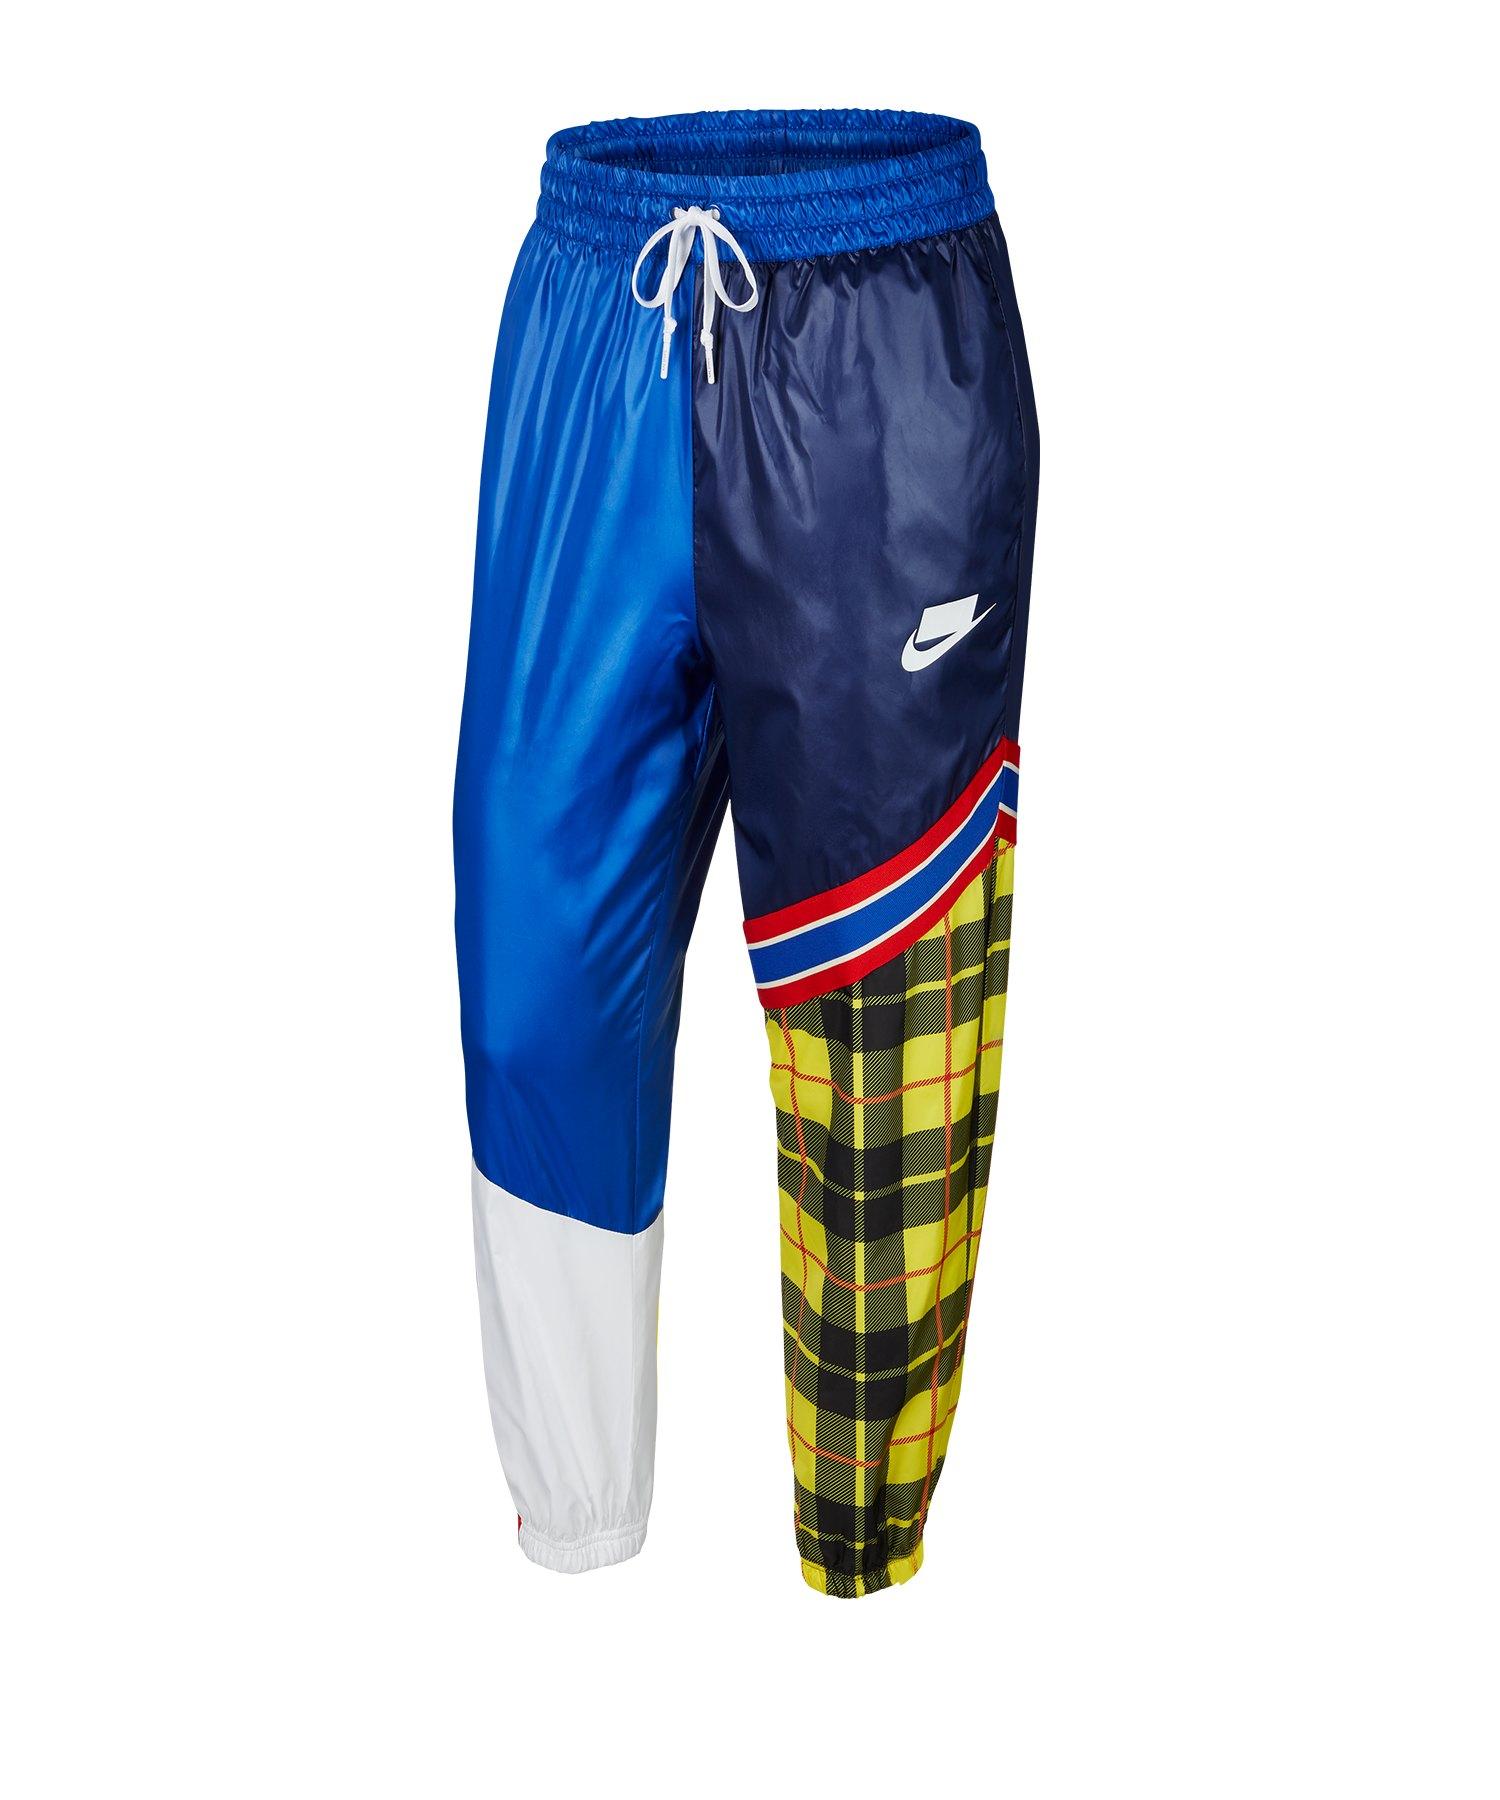 Nike Woven Mashed-Up Pant Hose Damen Blau F492 - blau